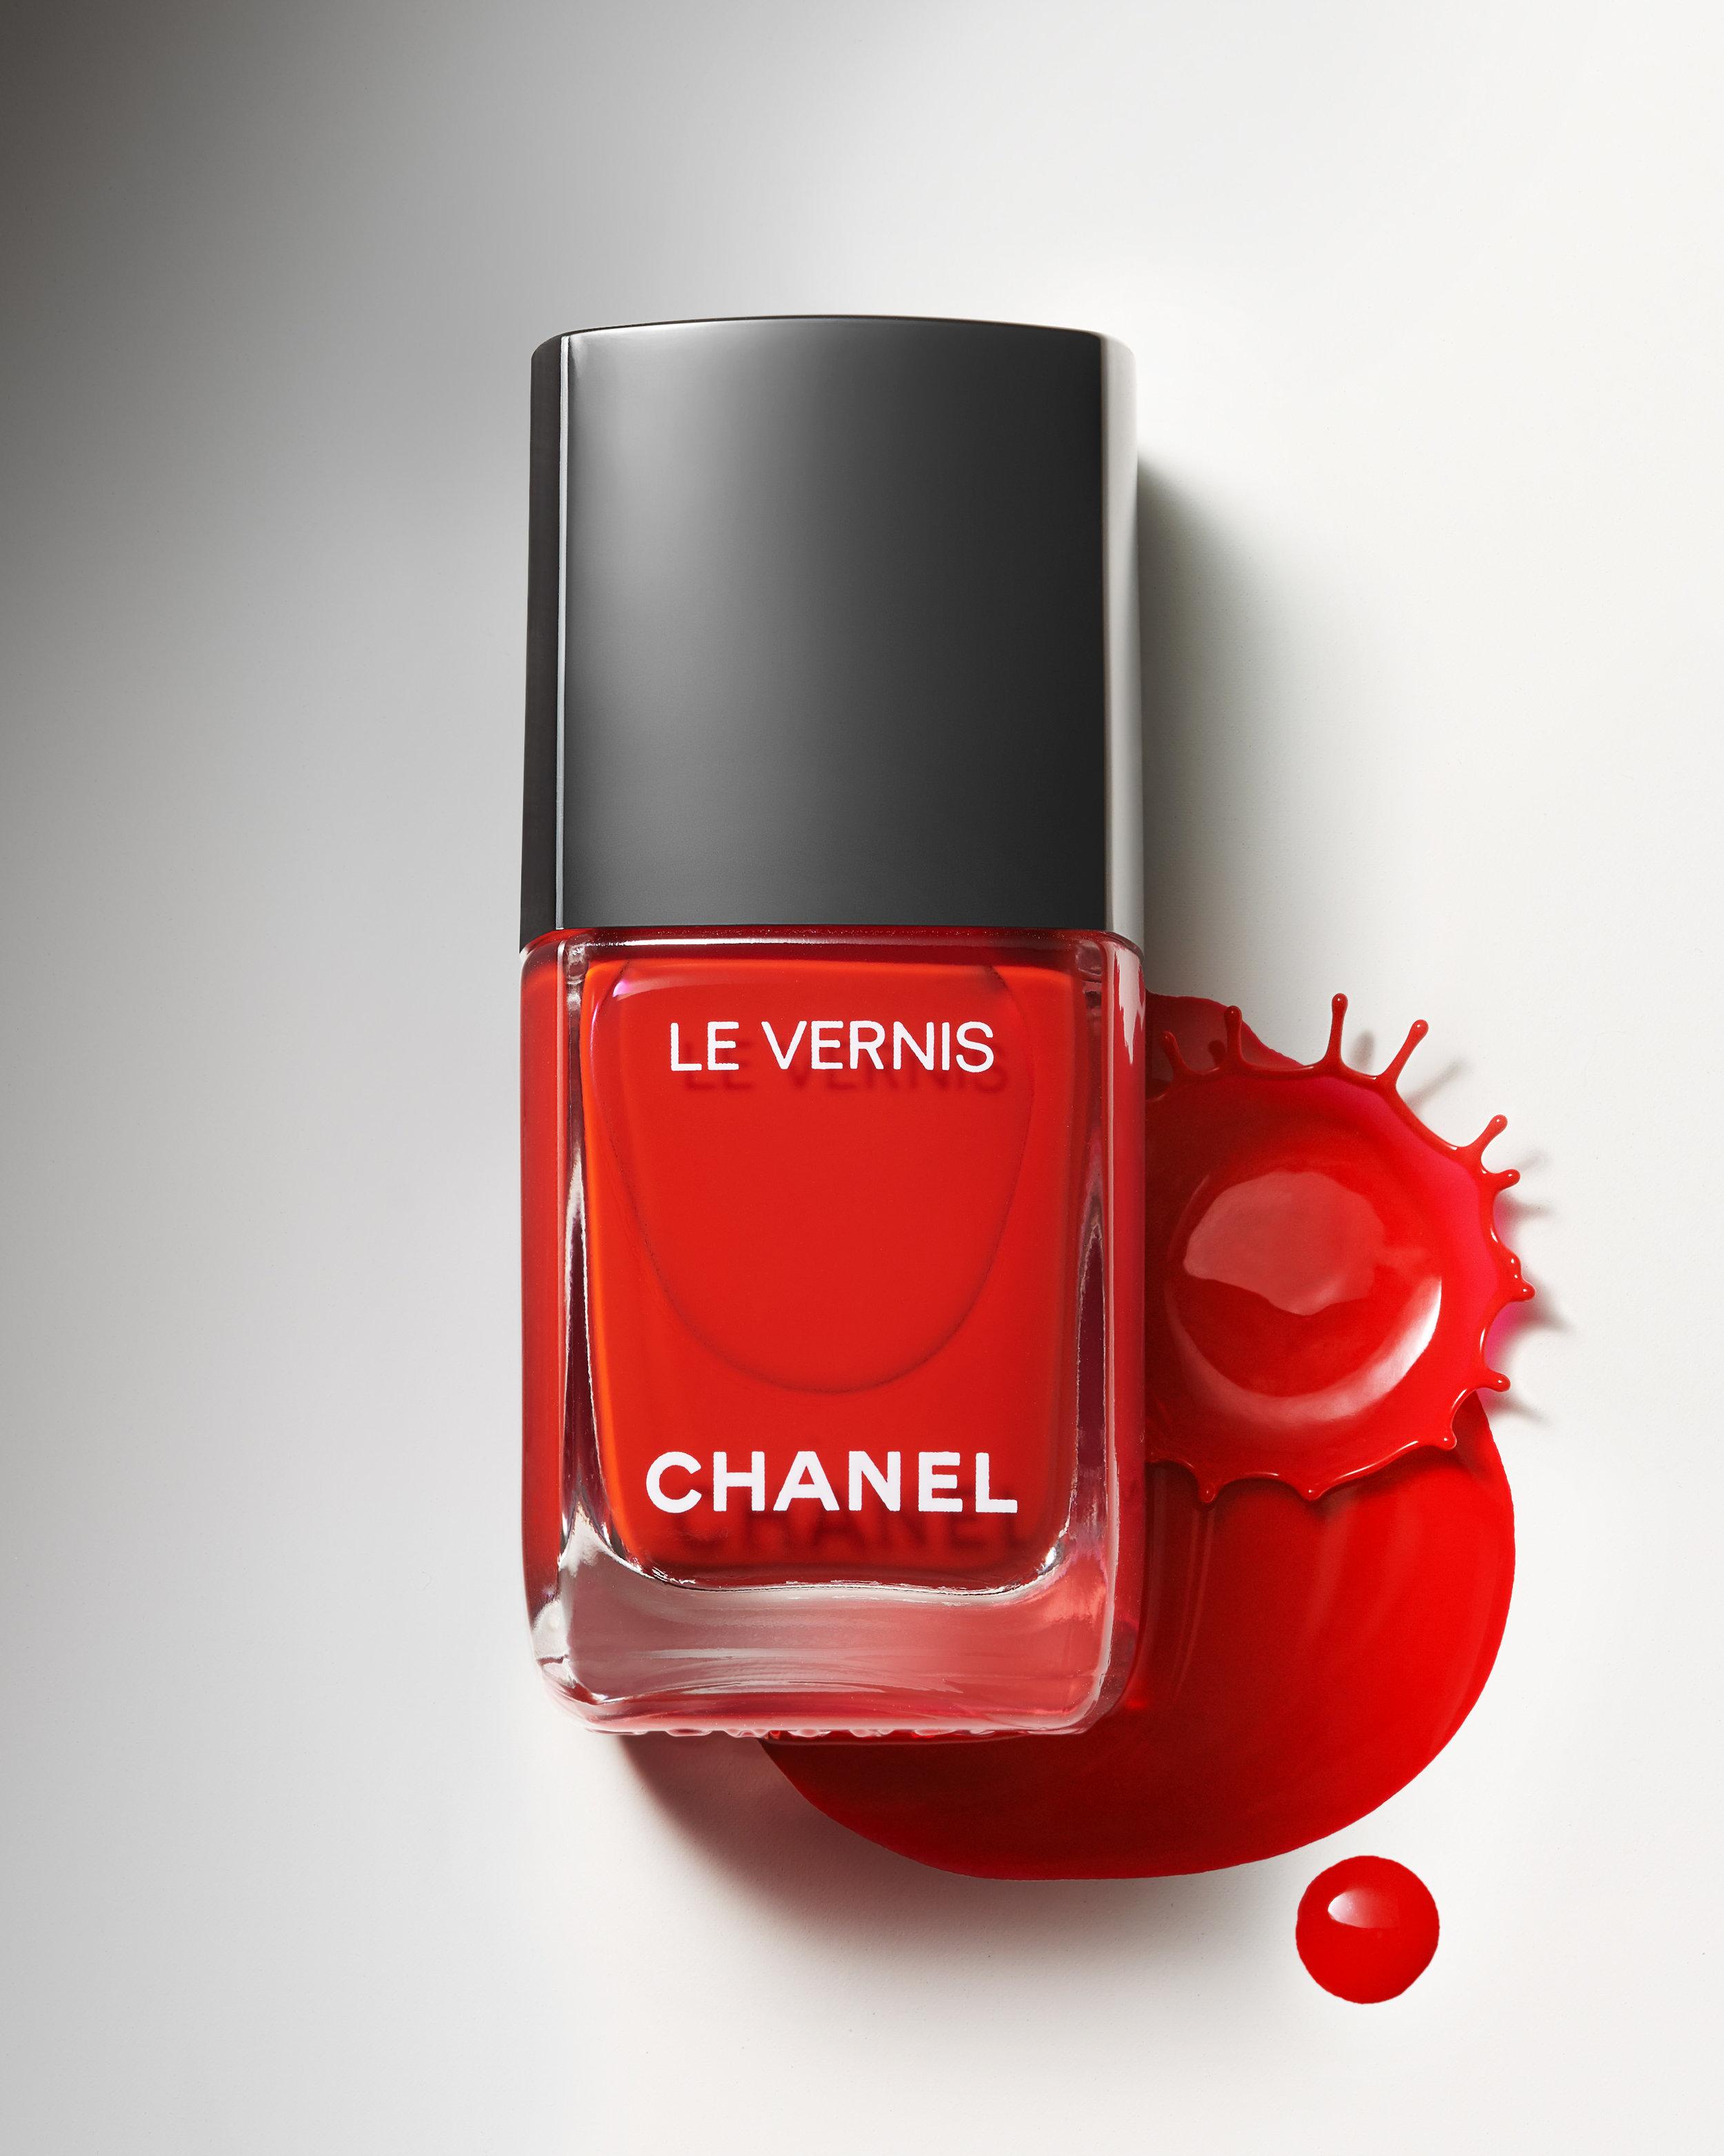 190703_Chanel_Nail_Polish_256-259_B.jpg